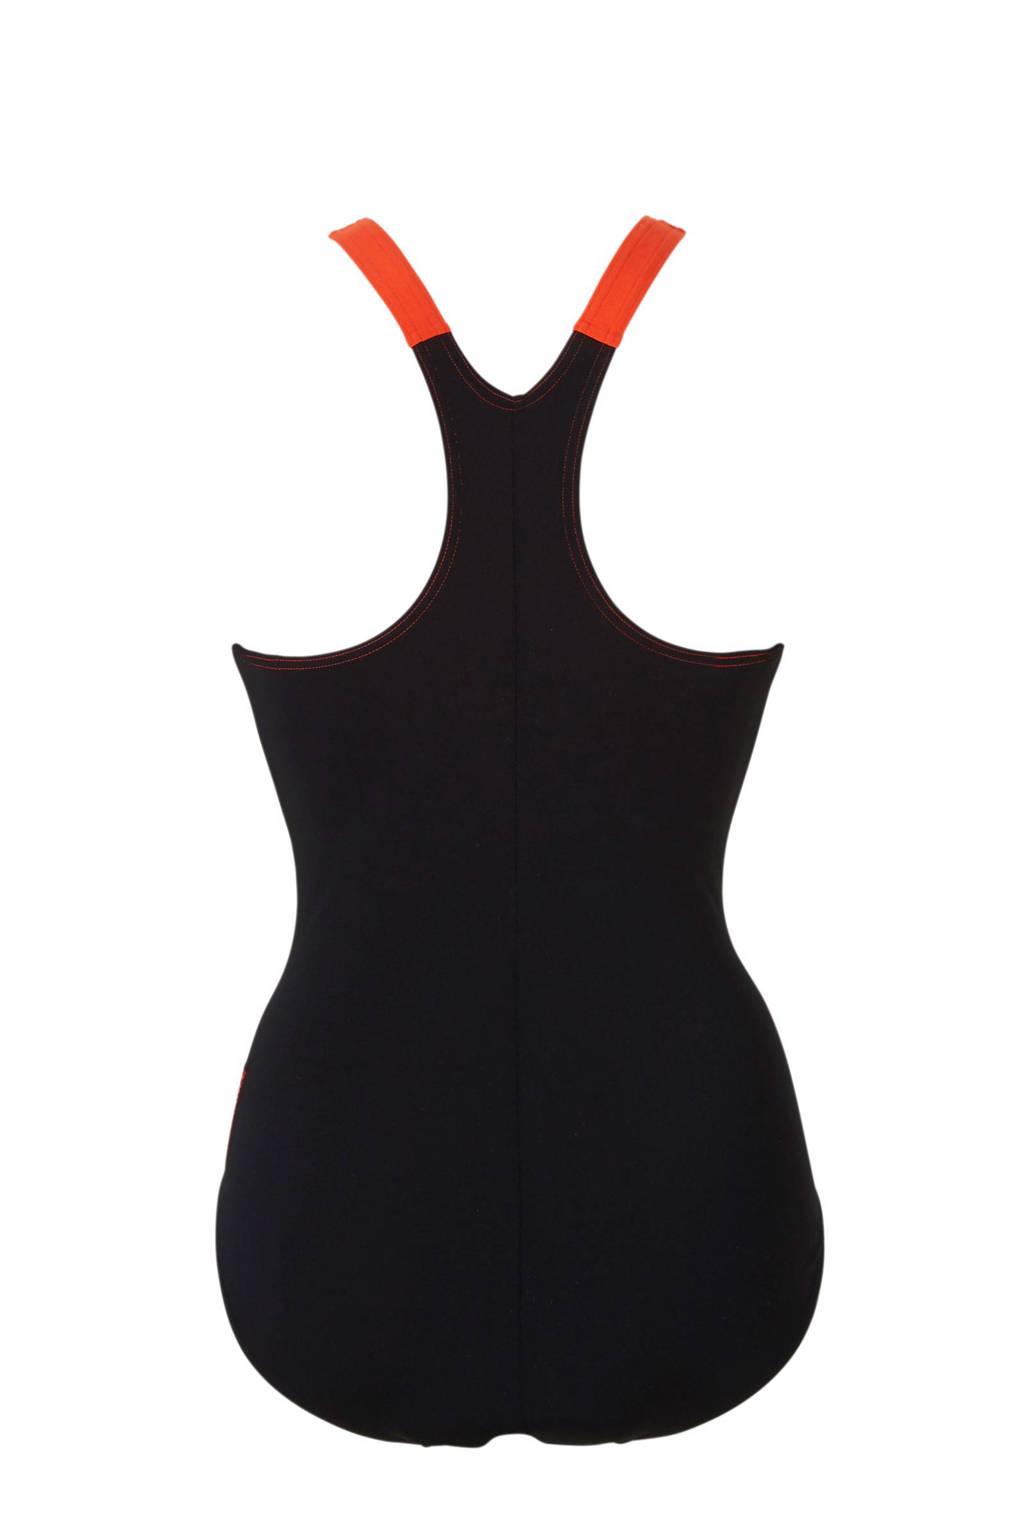 Speedo Endurance+ sportbadpak zwart/rood, Zwart/rood